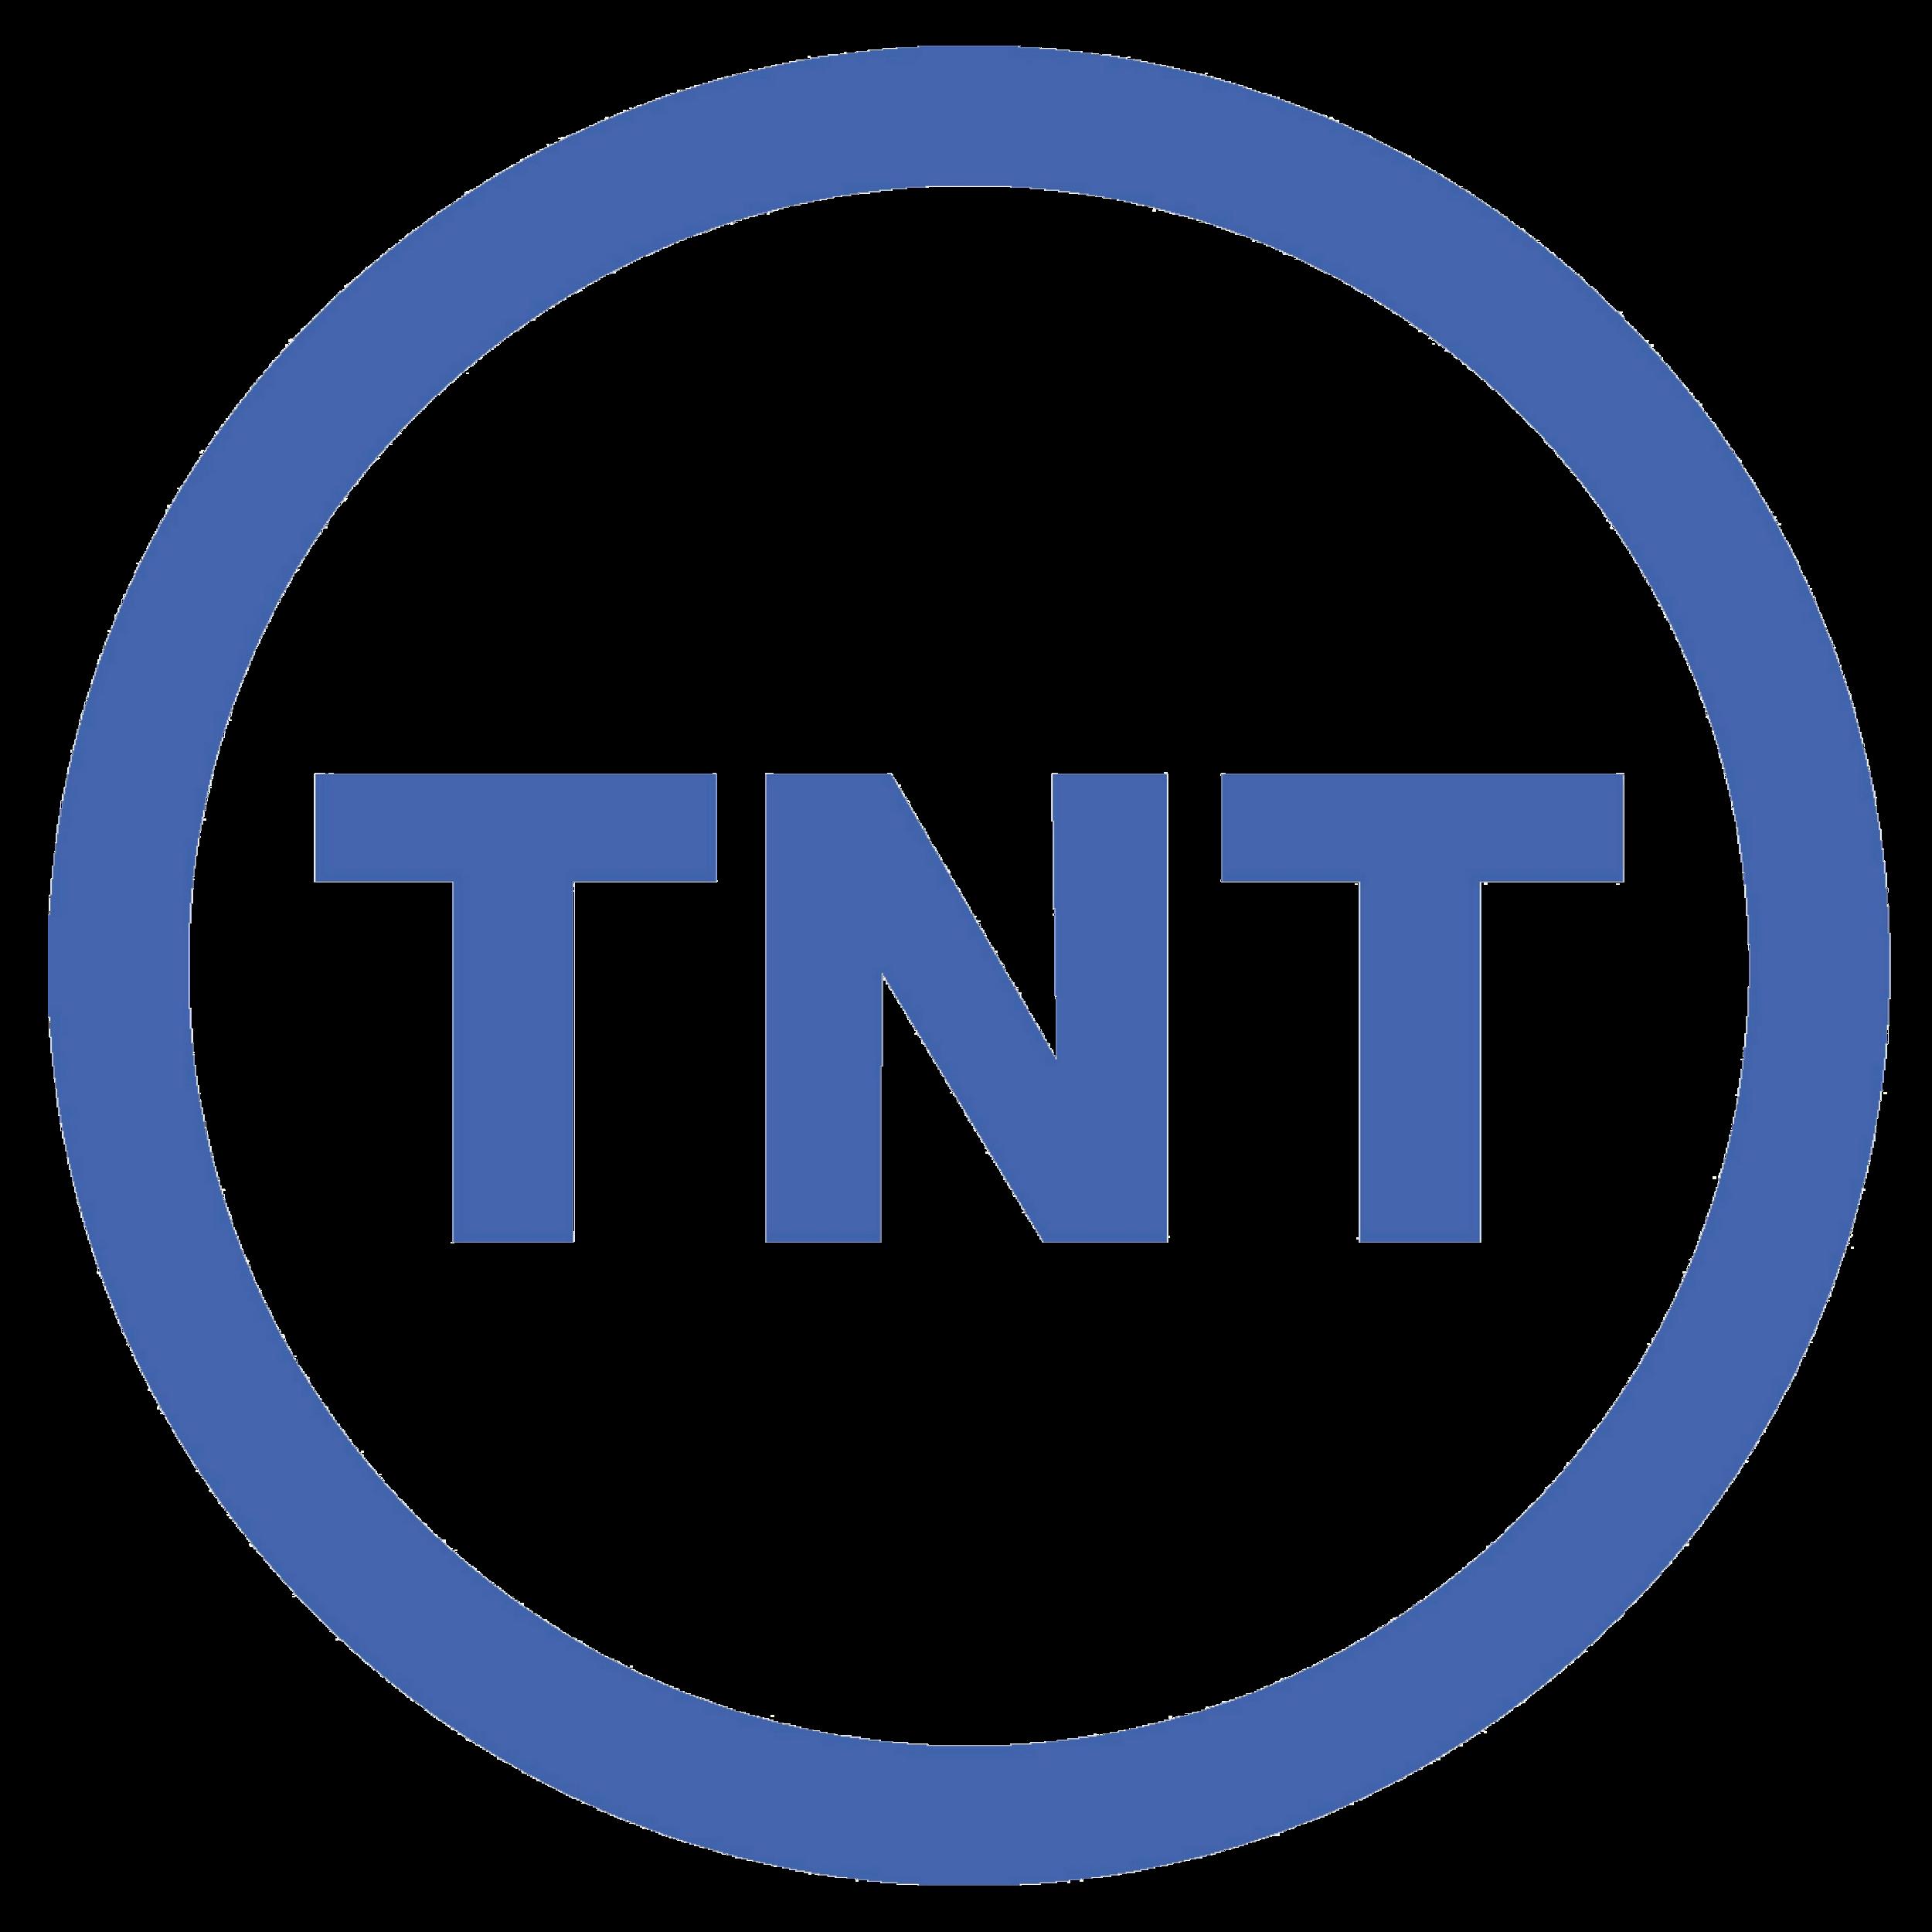 tnt_logo_png.png